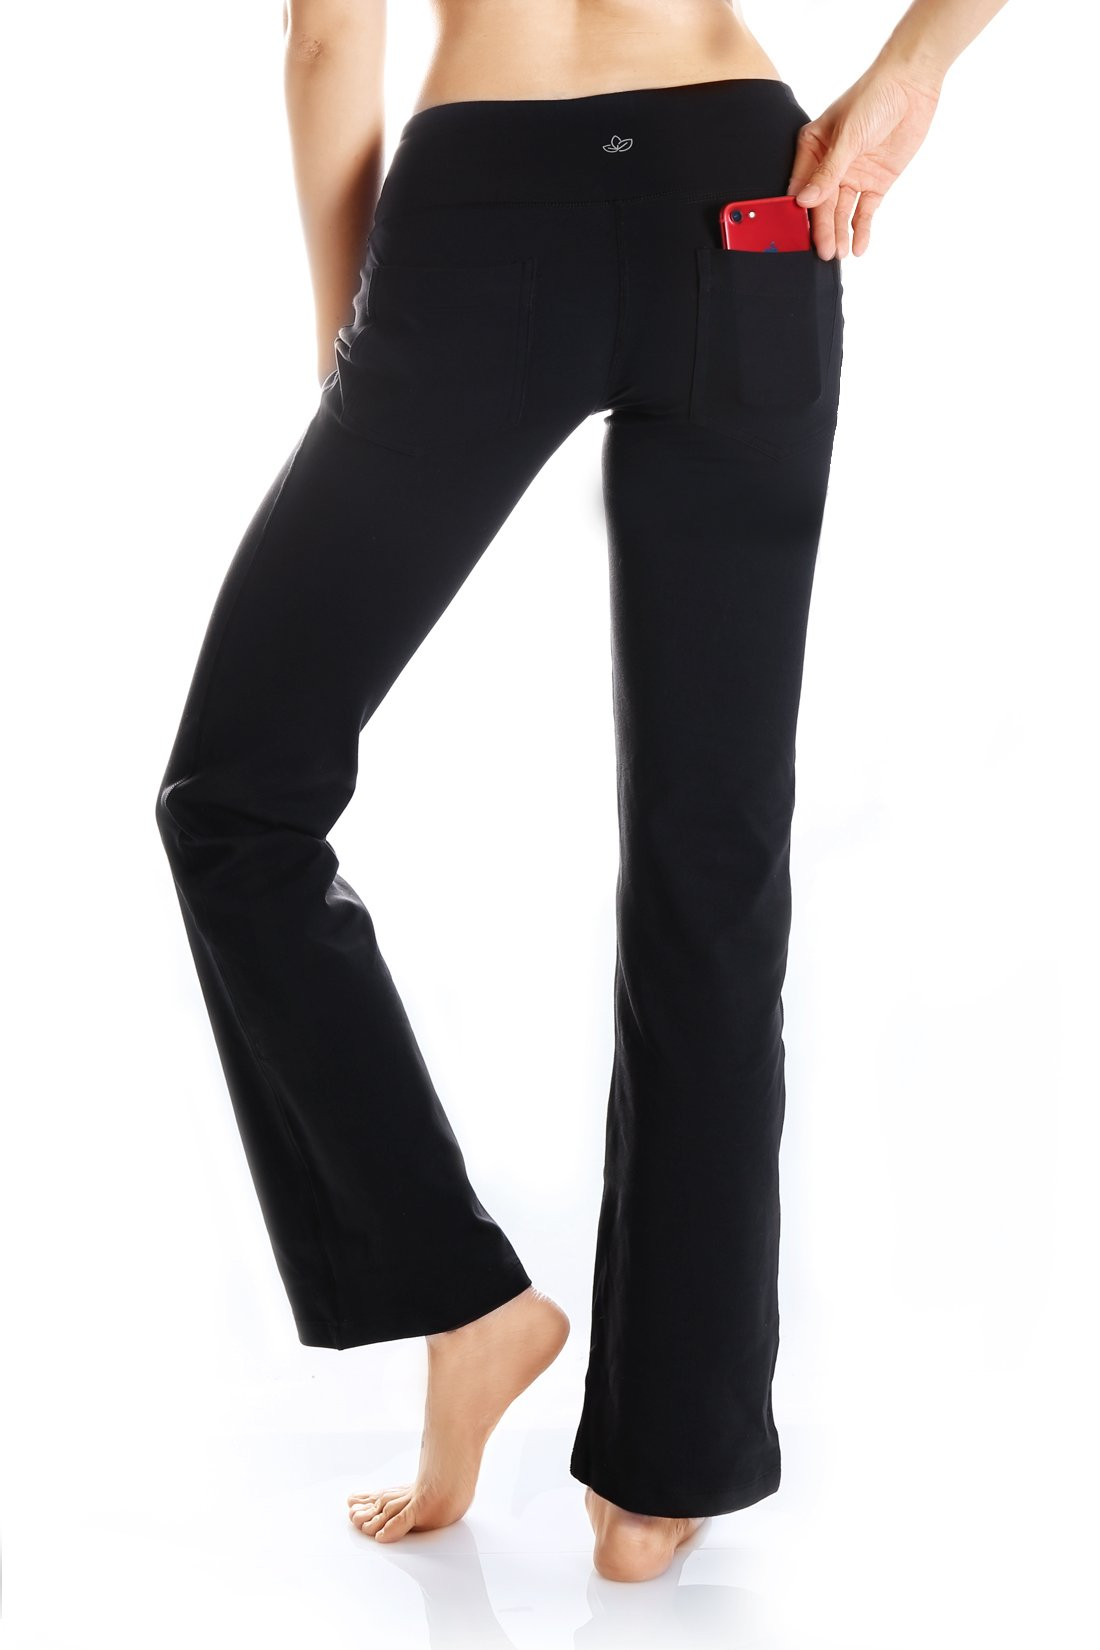 fa4d18e510 Yogipace 2 Back Pockets 29 31 33 35 37 Inseam Women S Bootcut. Naviskin Womens  Bootcut Yoga Pants Bootleg ...